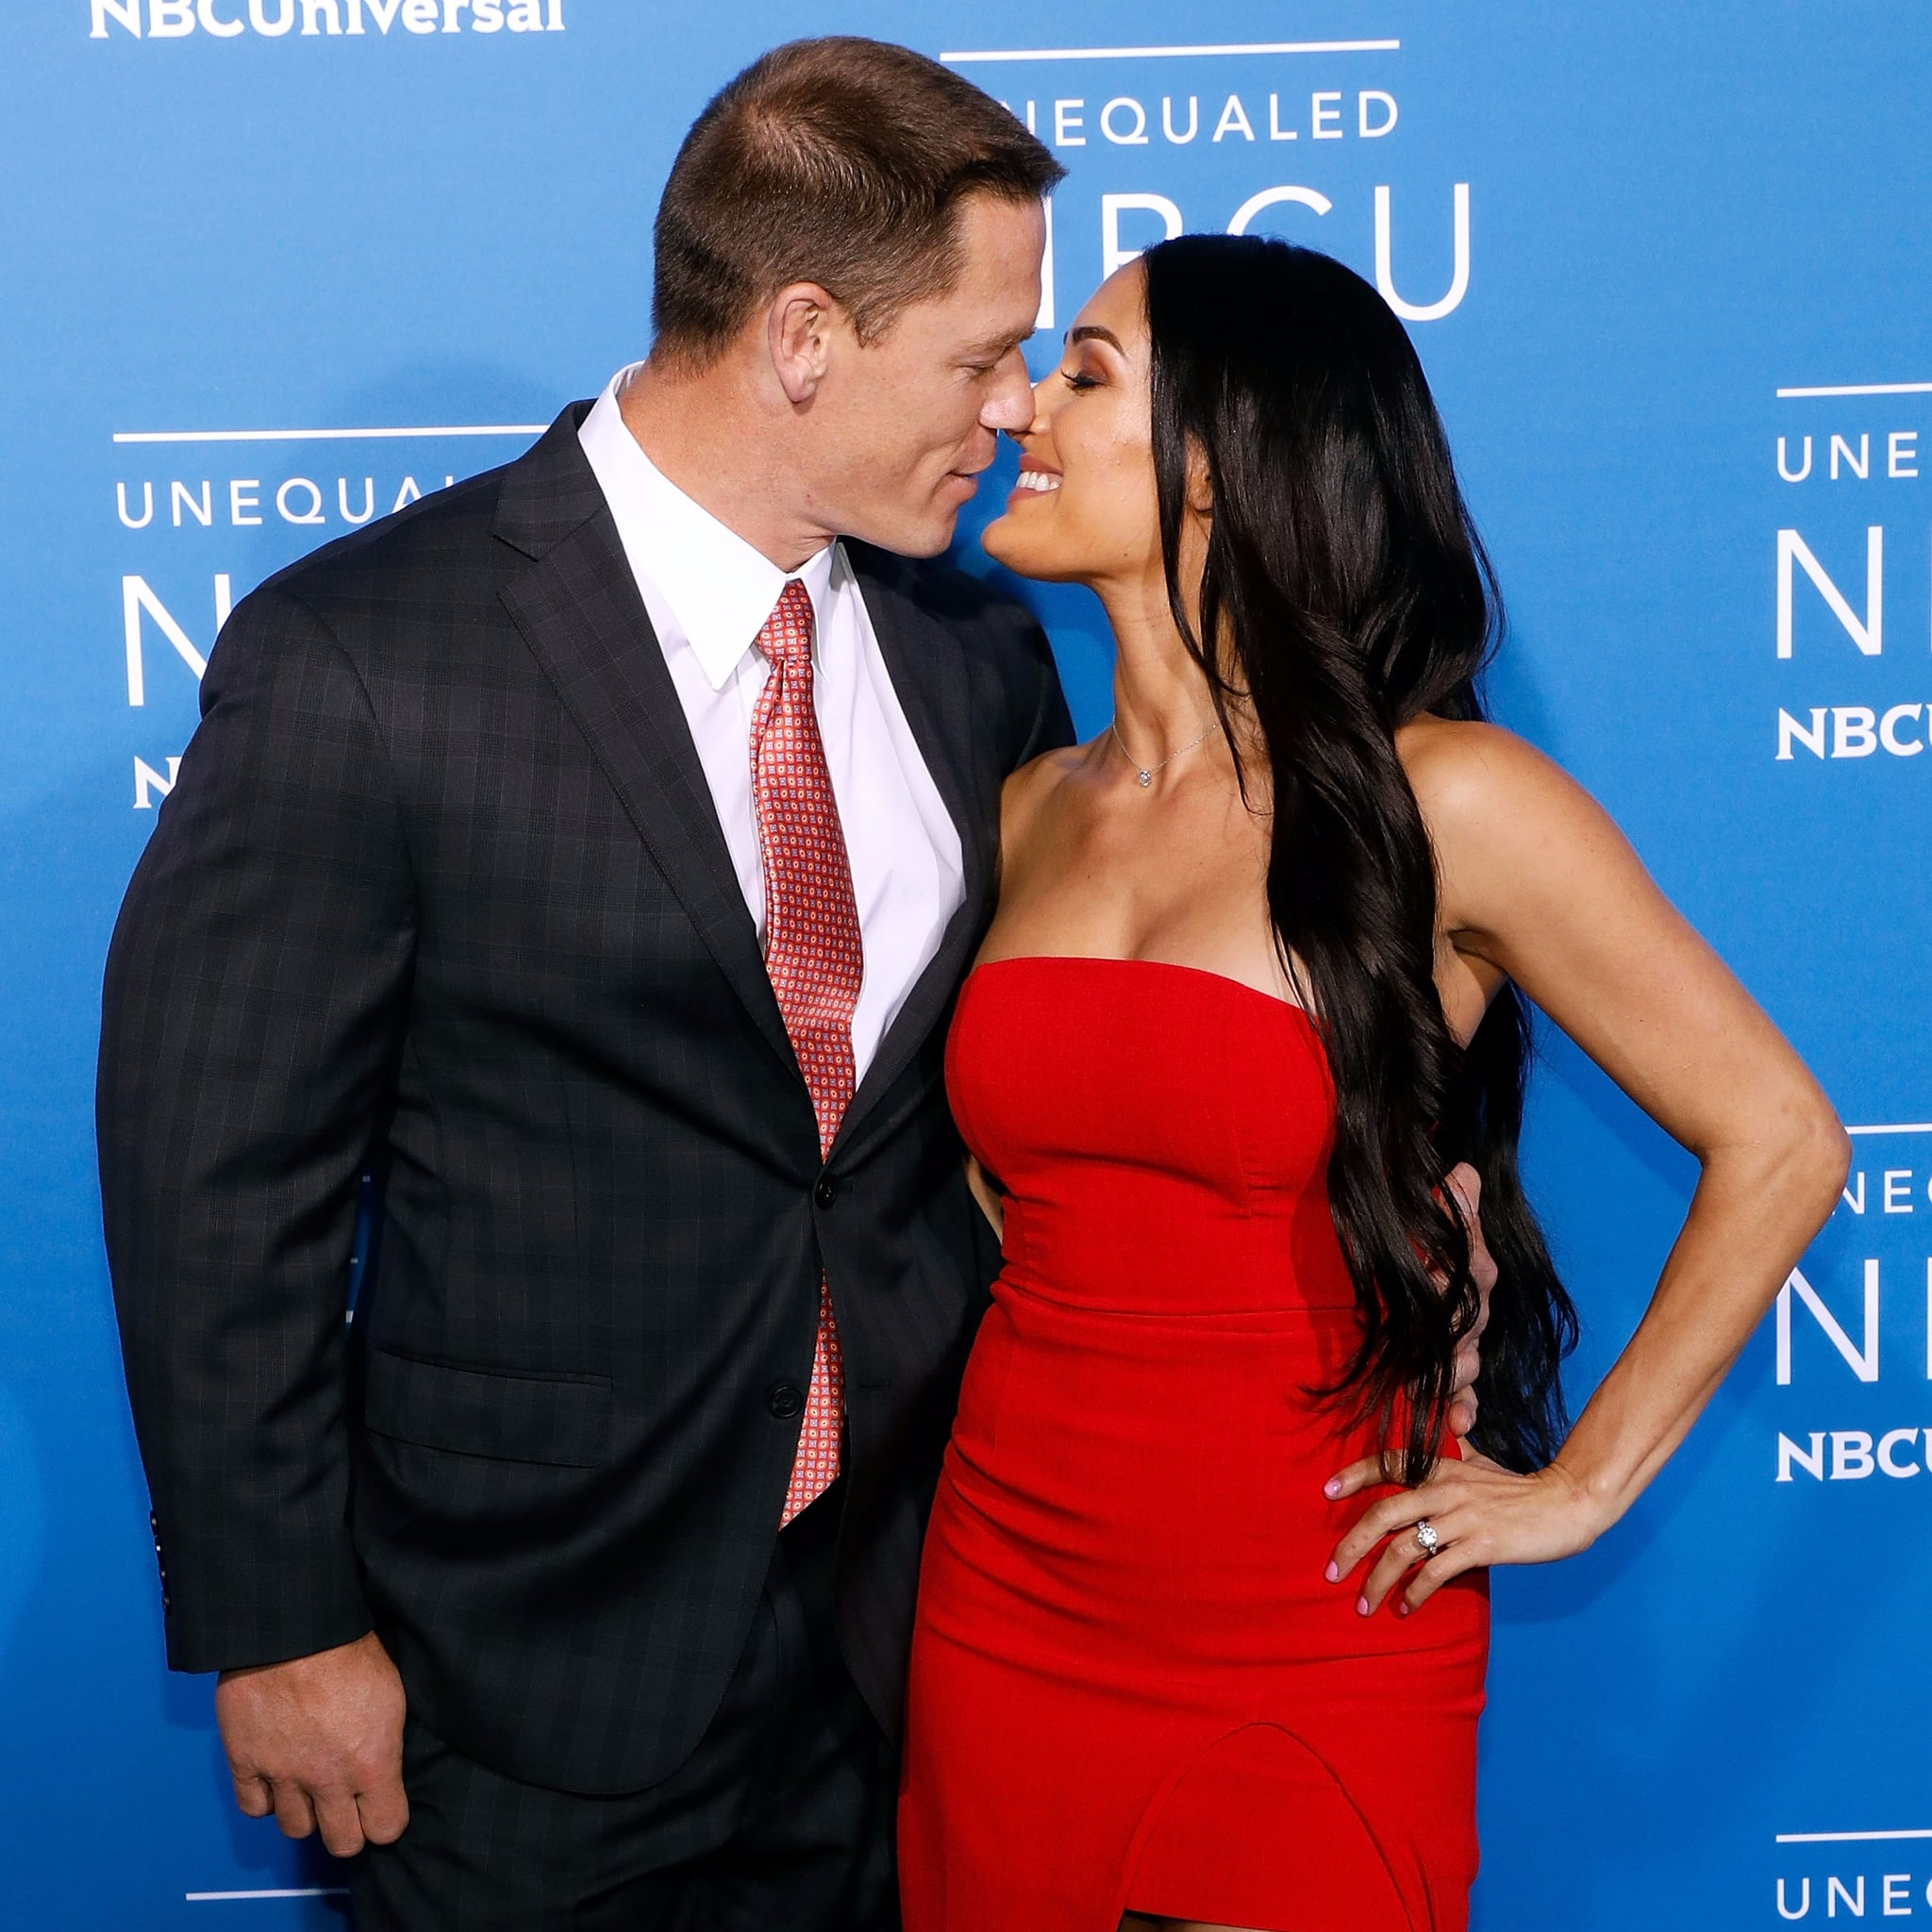 Wrestling Couple John Cena & Nikki Bella Go Into Turbo Wedding Planning Mode!